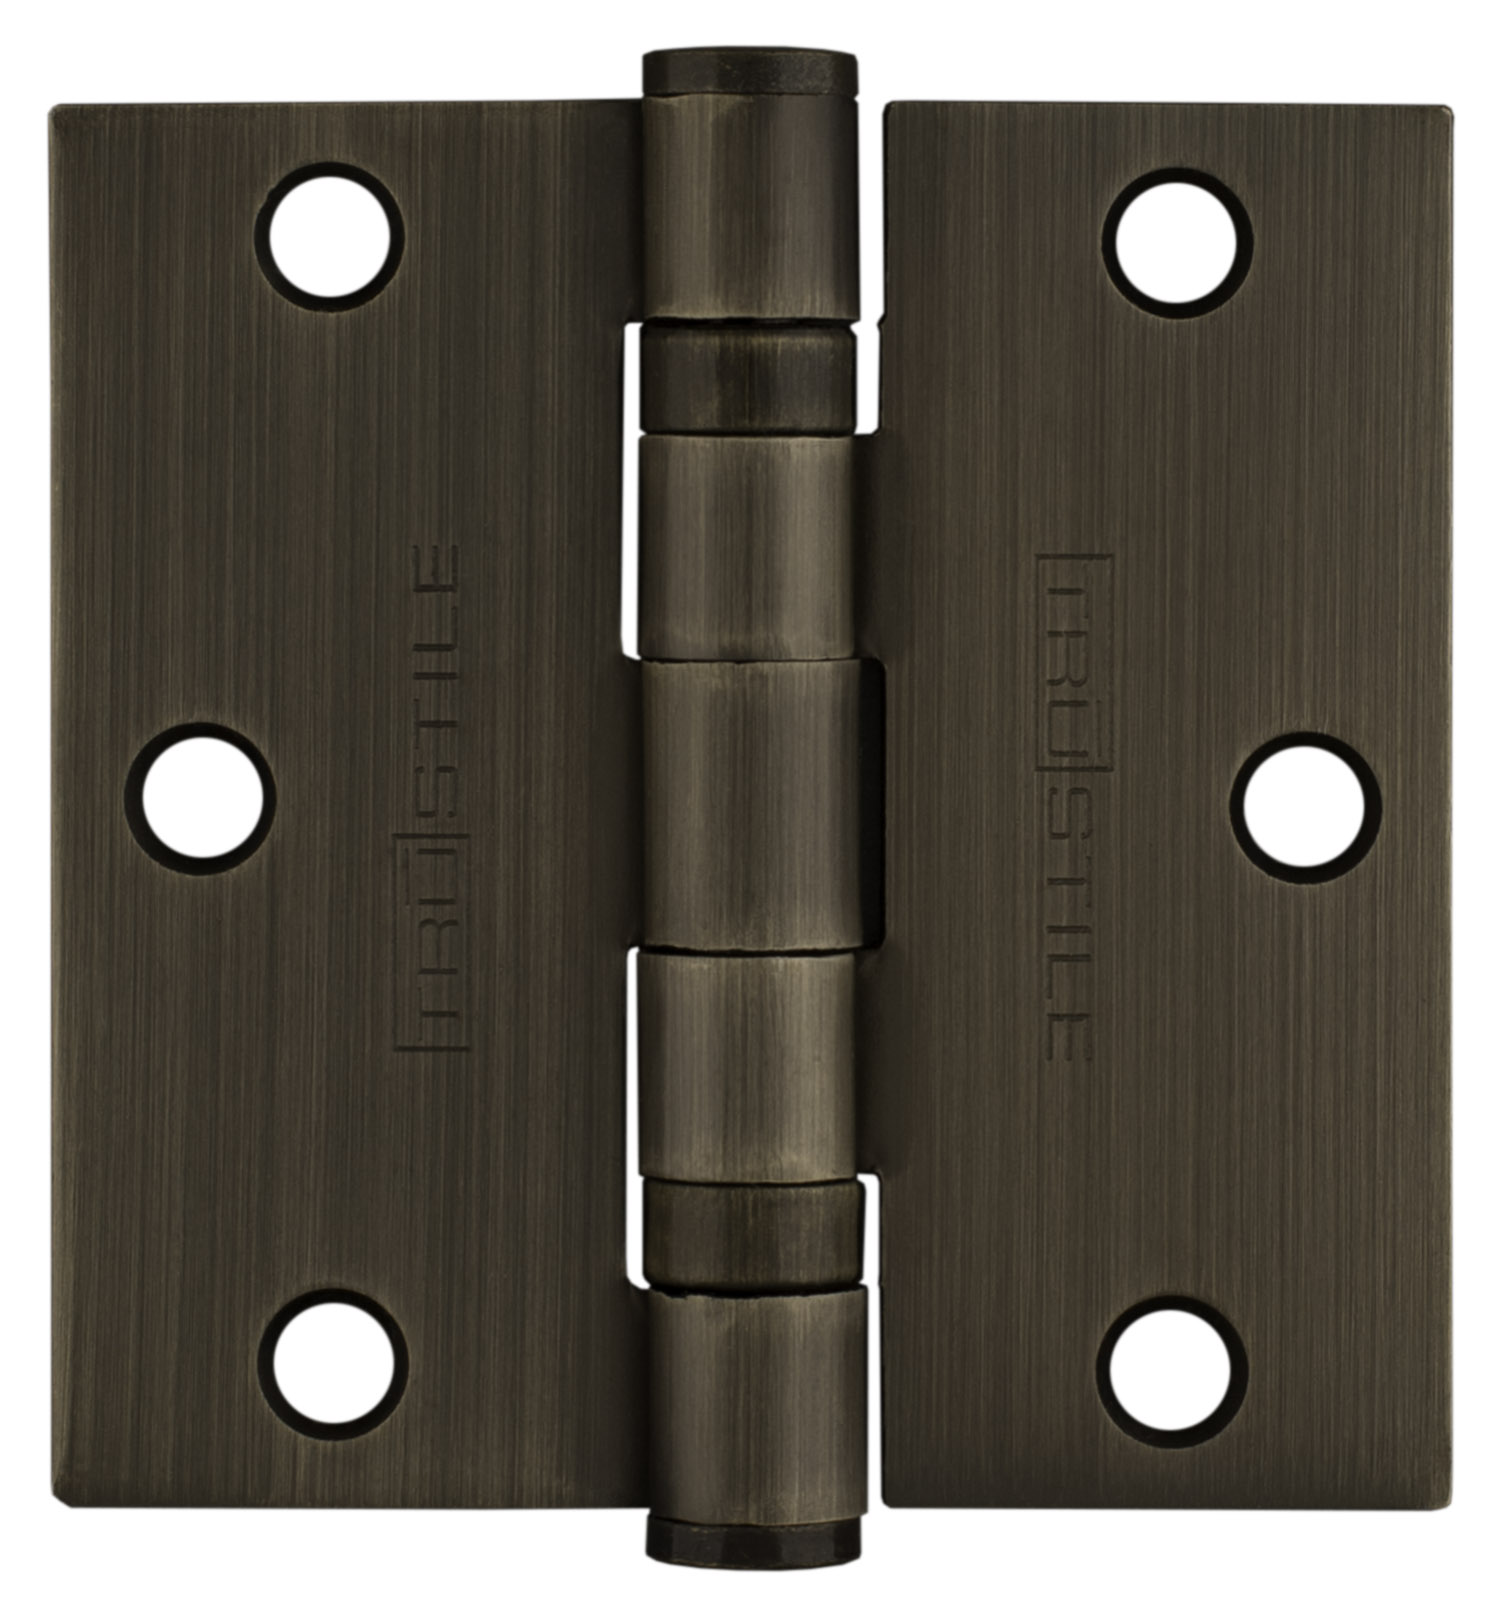 US5 Antique Brass - Hinge Options TruStile Doors